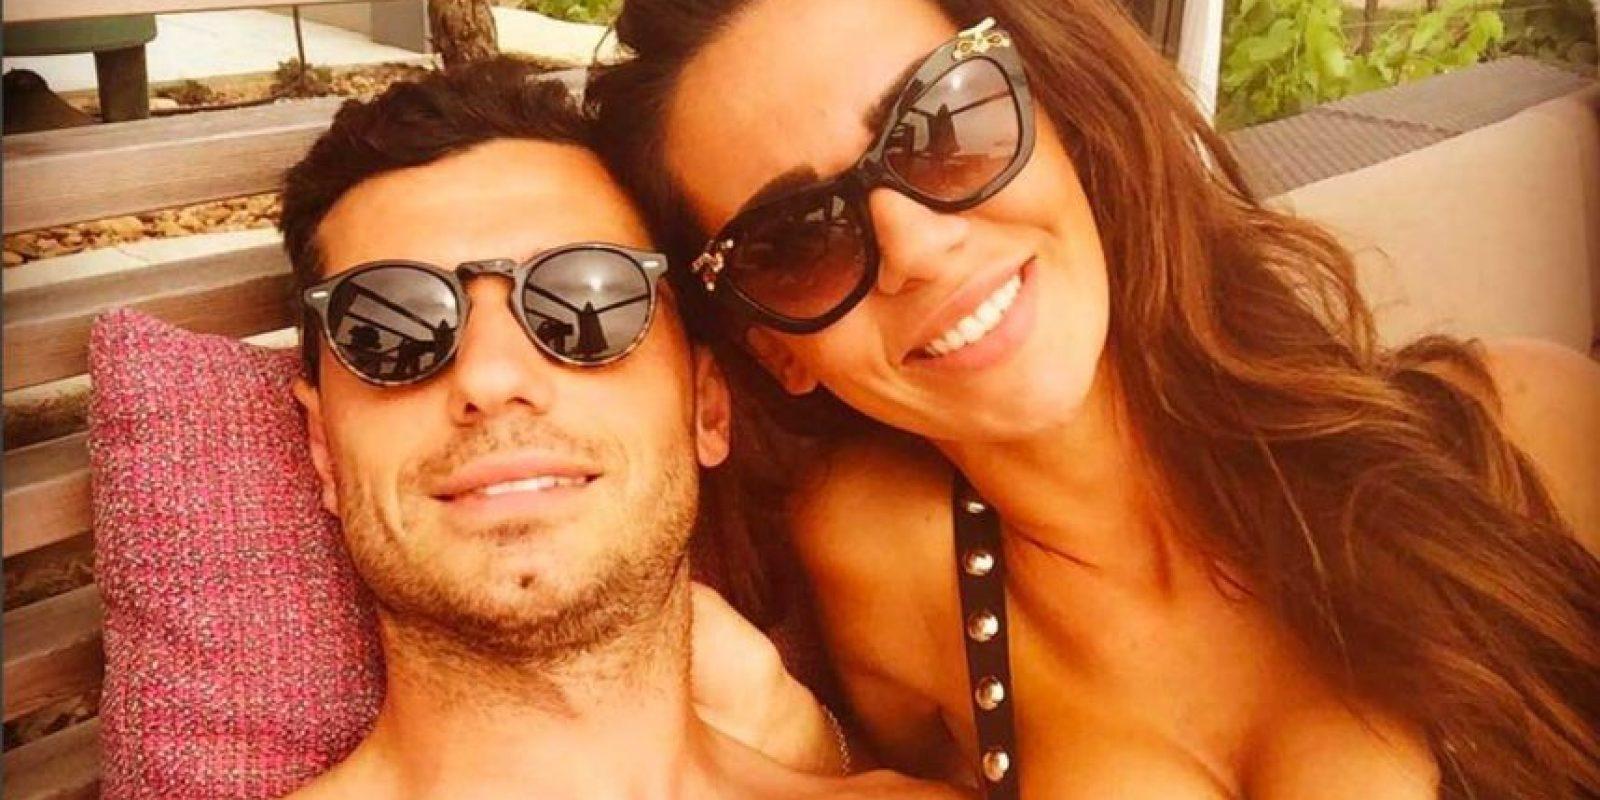 Foto:Vía instagram.com/erjona.dzemaili